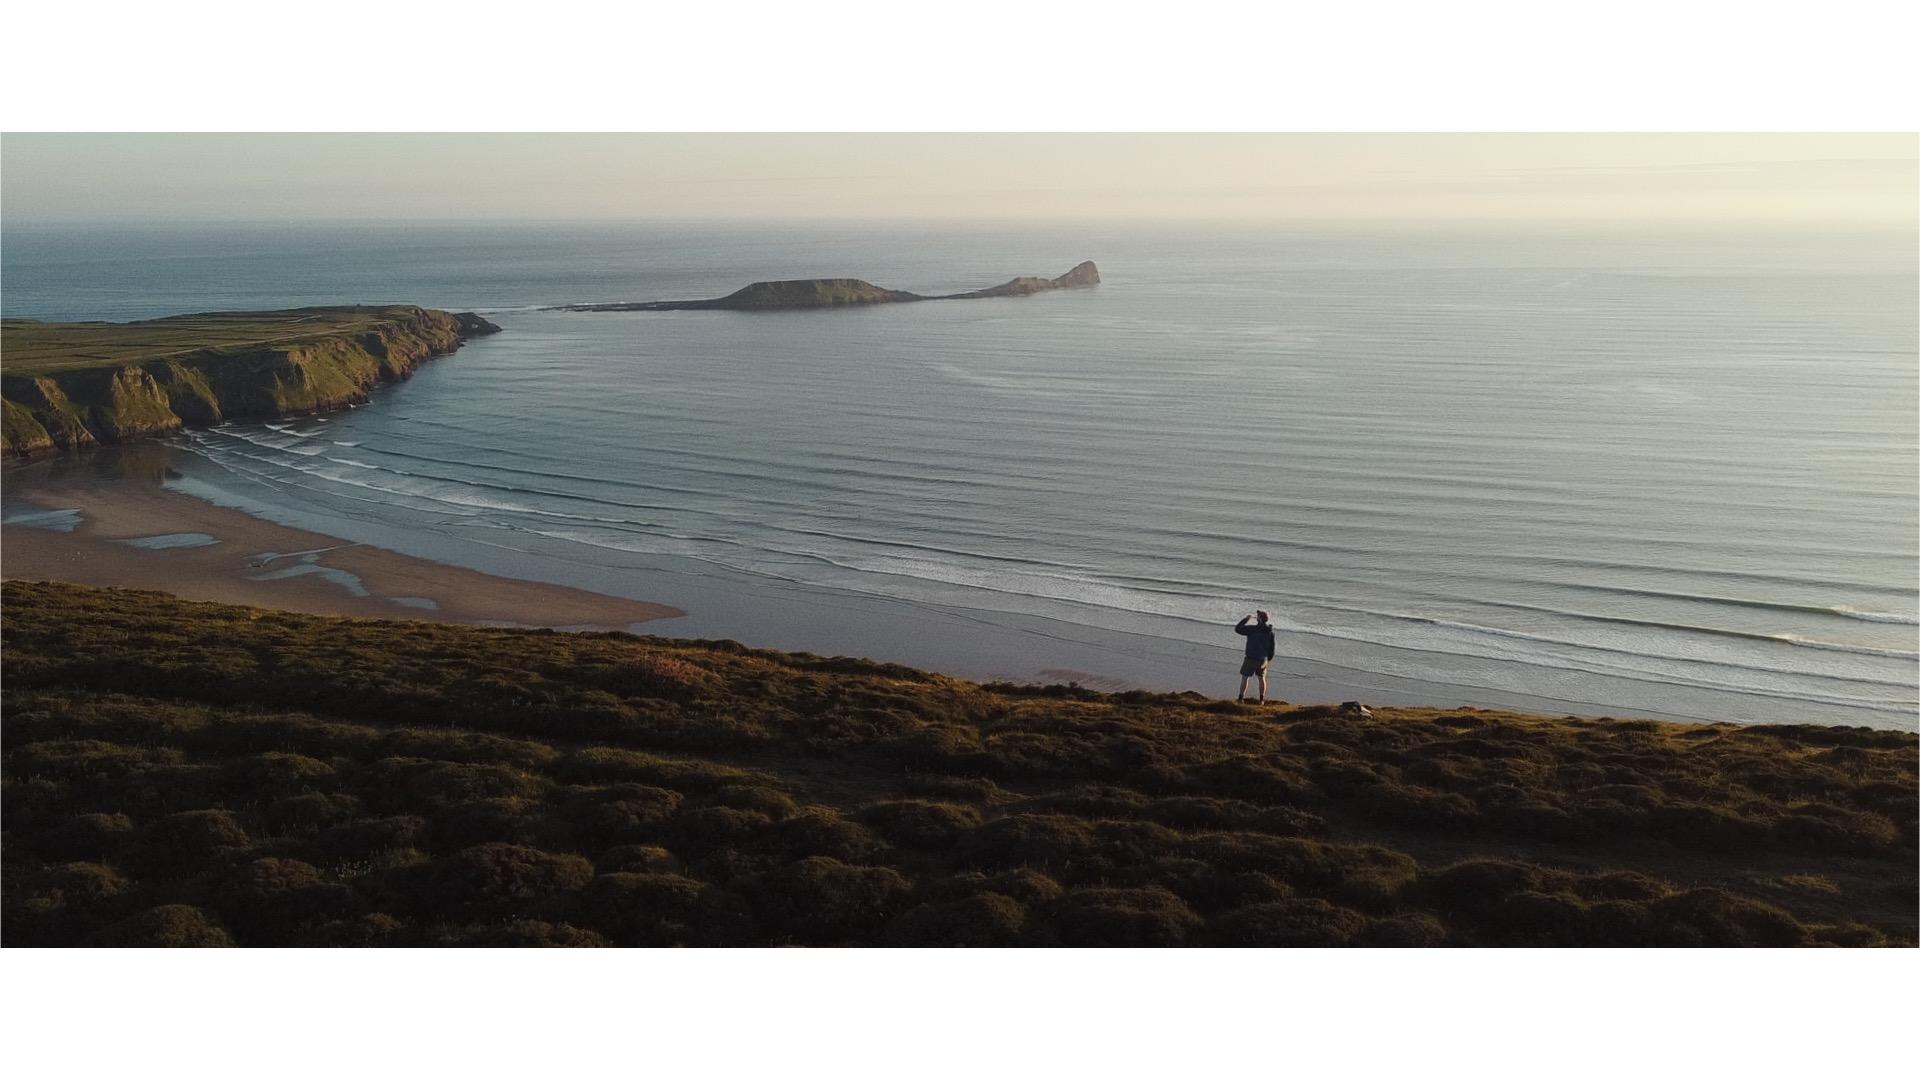 Rhosilli Down Hiking Path Gower Peninsula